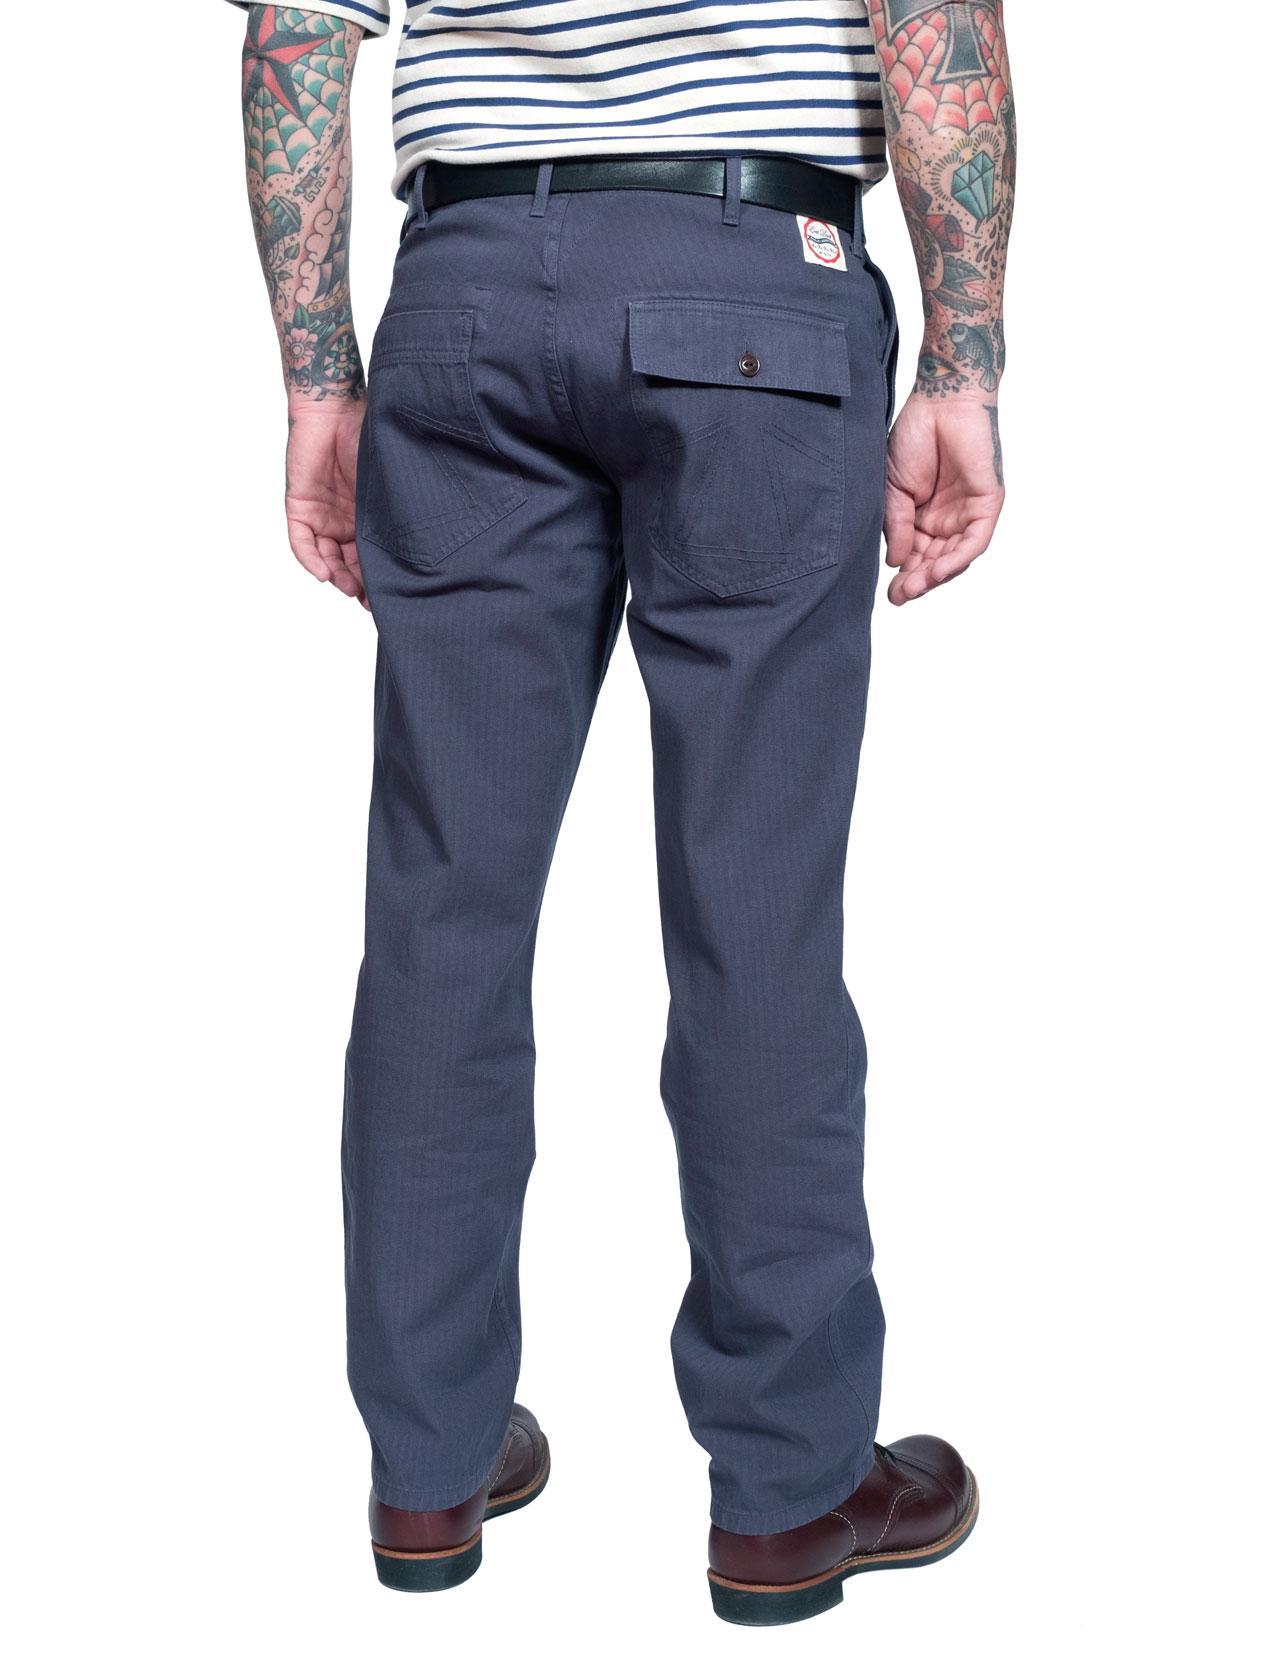 Eat Dust - Deck Fatigue Pant HBT - Peacoat Blue 371363d166a